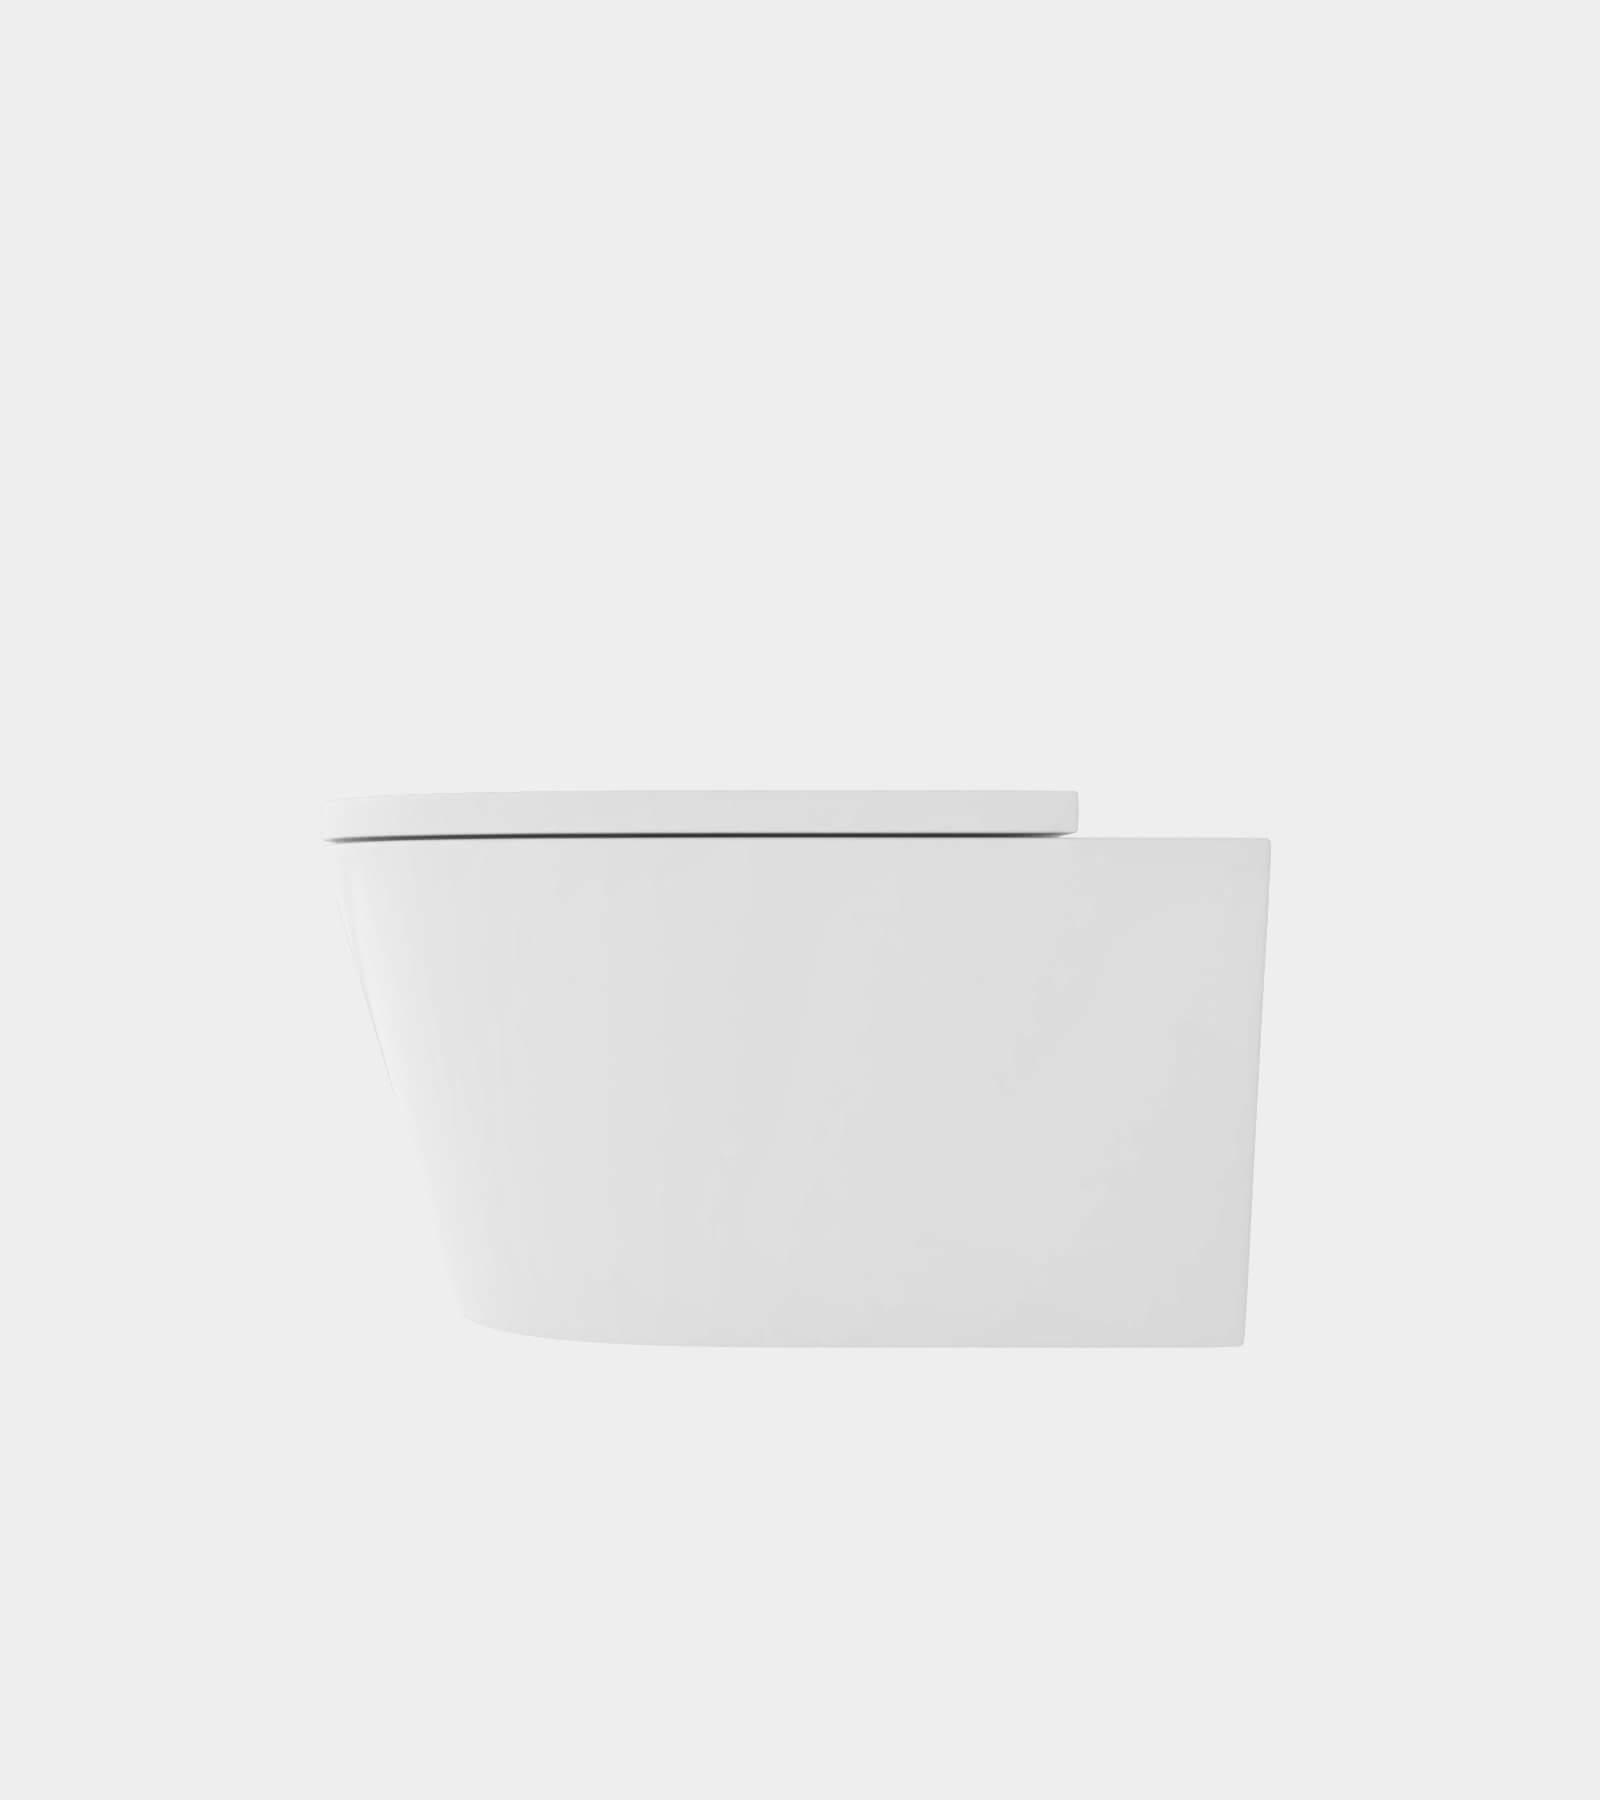 Wall mounted wc pan 1 - 3D Model